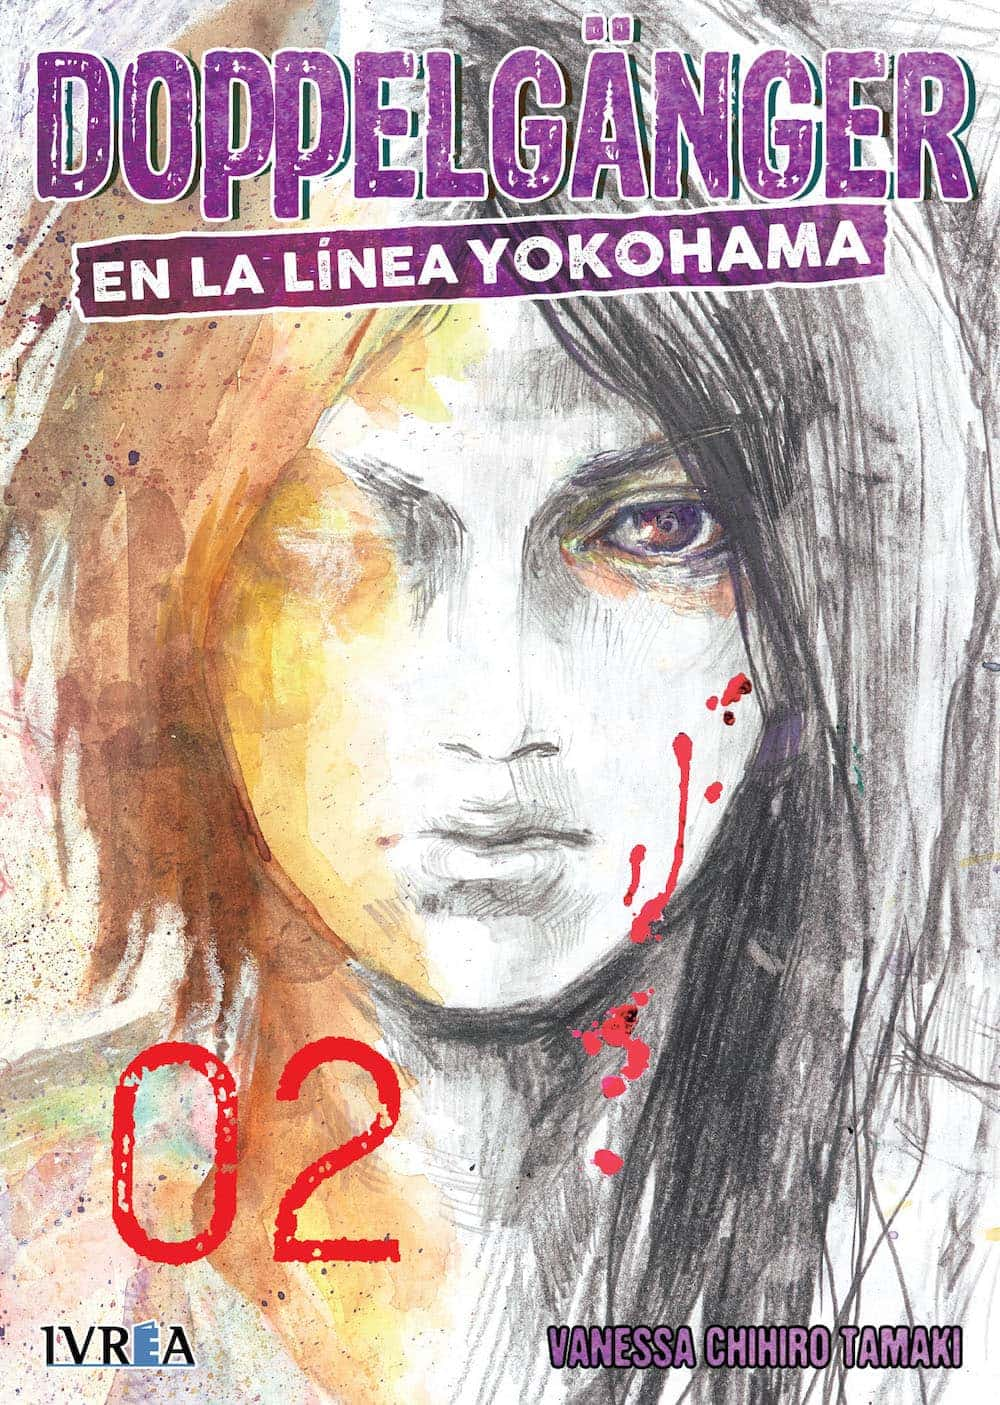 DOPPELGANGER 02 EN LA LINEA DE YOKOHAMA